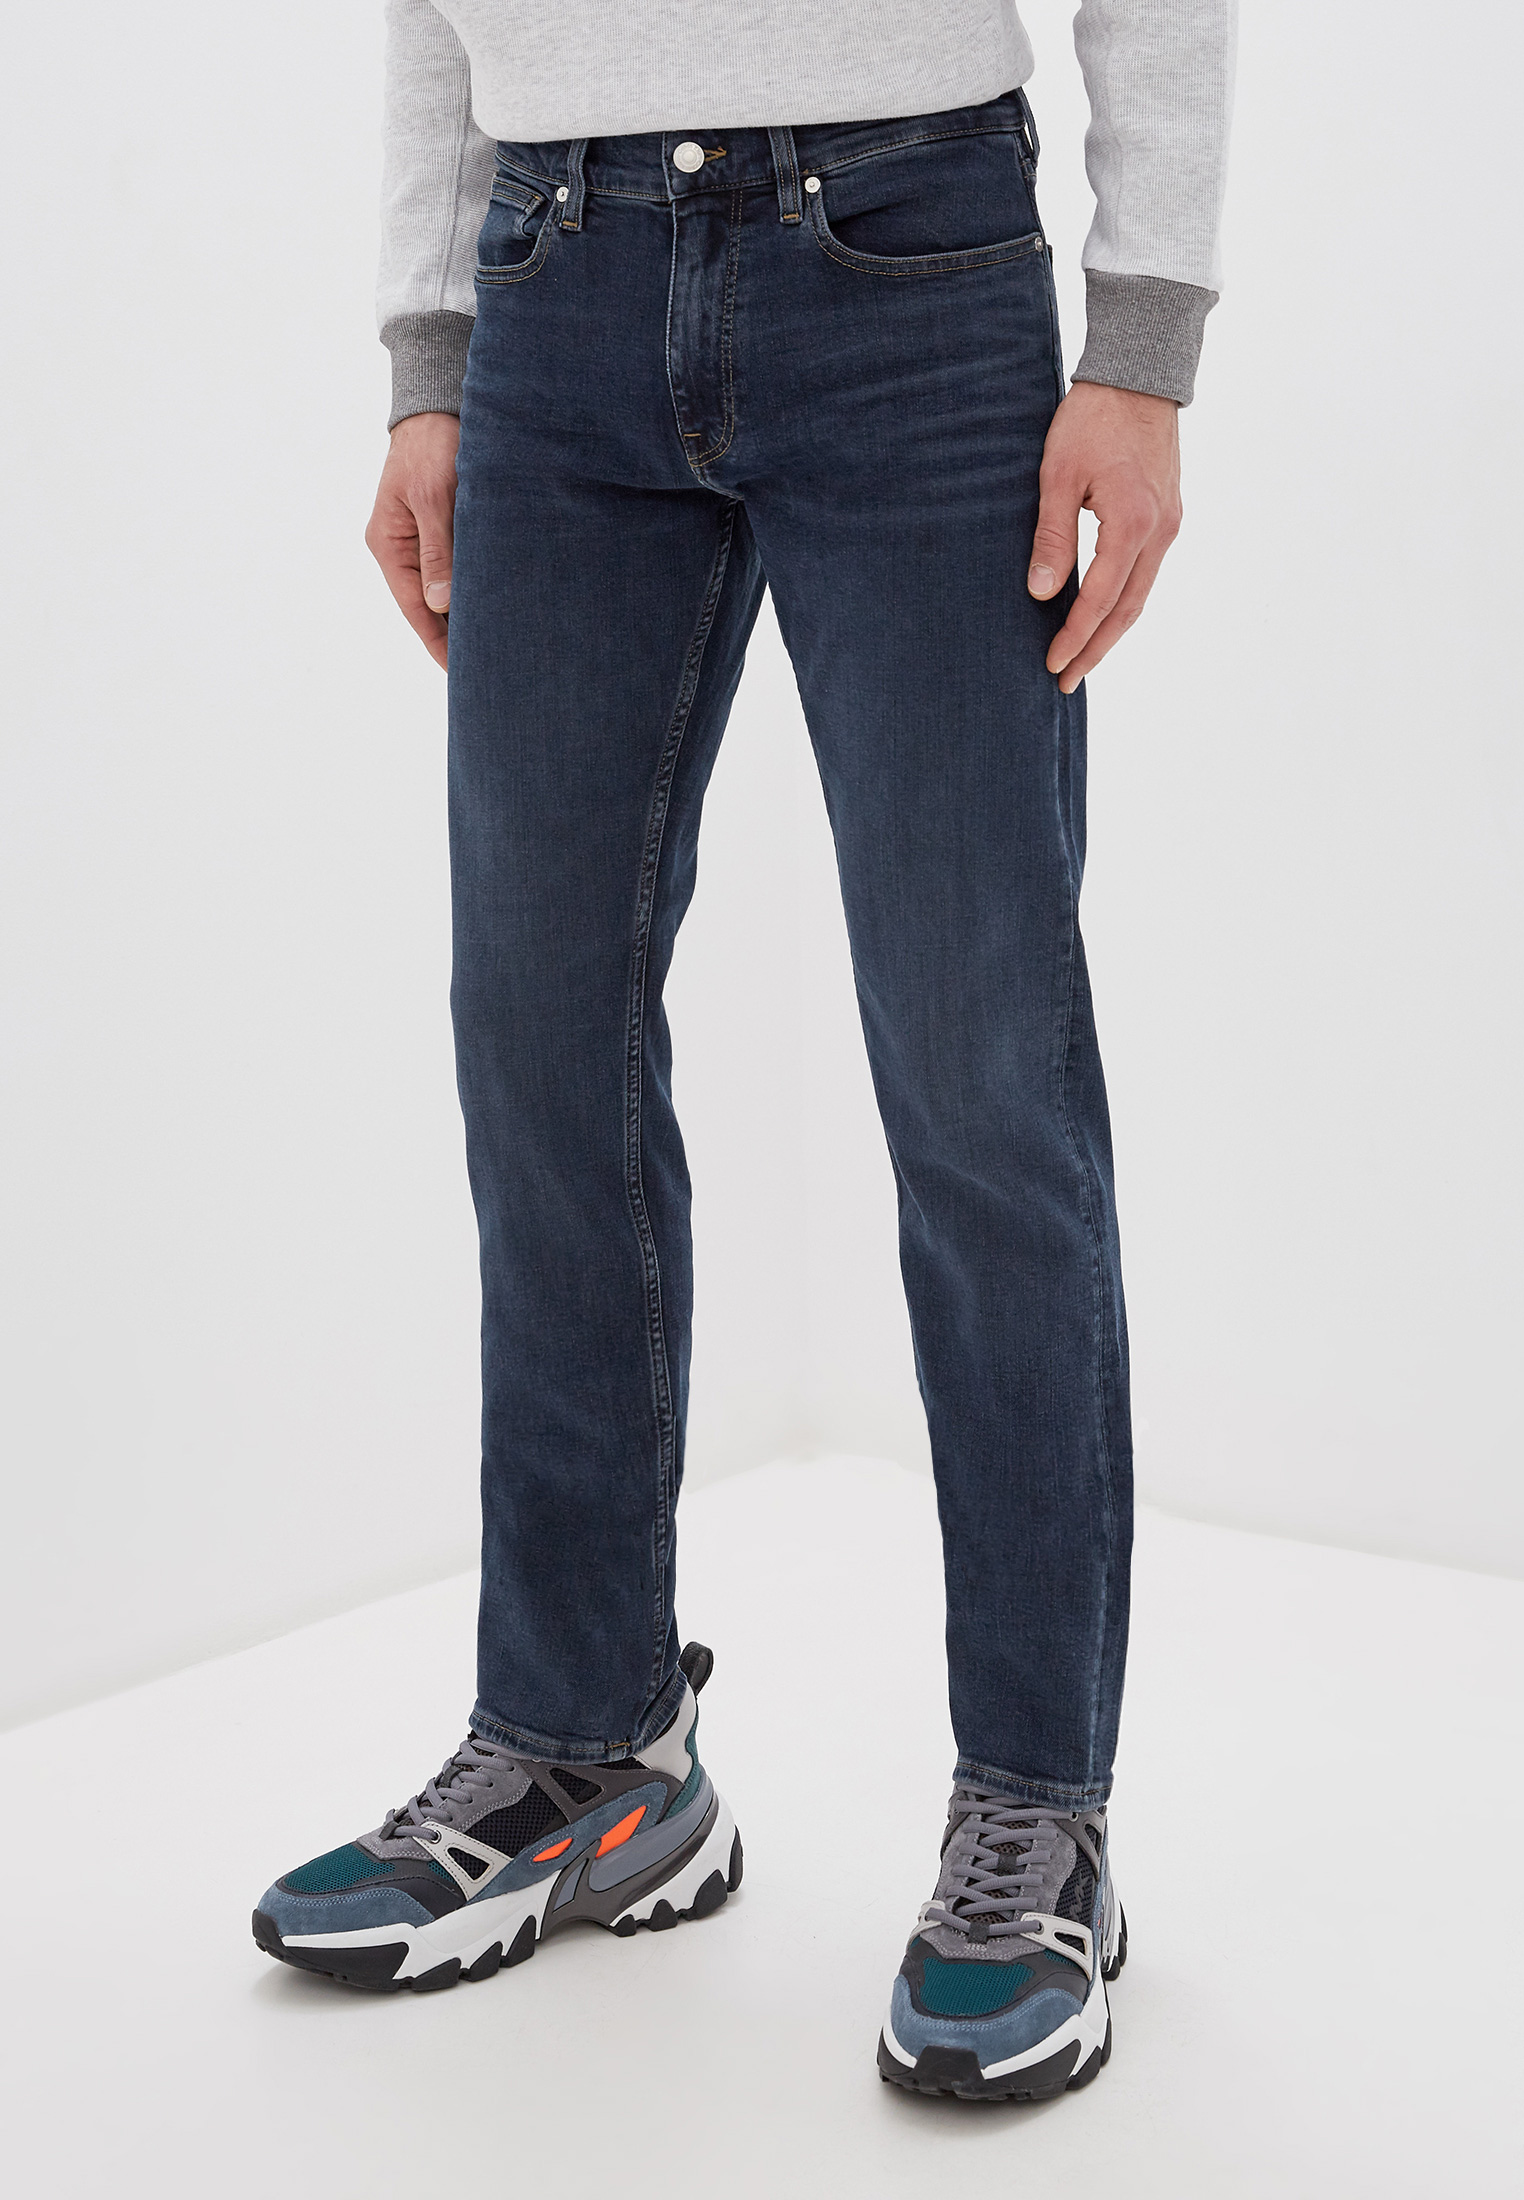 Зауженные джинсы Calvin Klein (Кельвин Кляйн) k10k105113